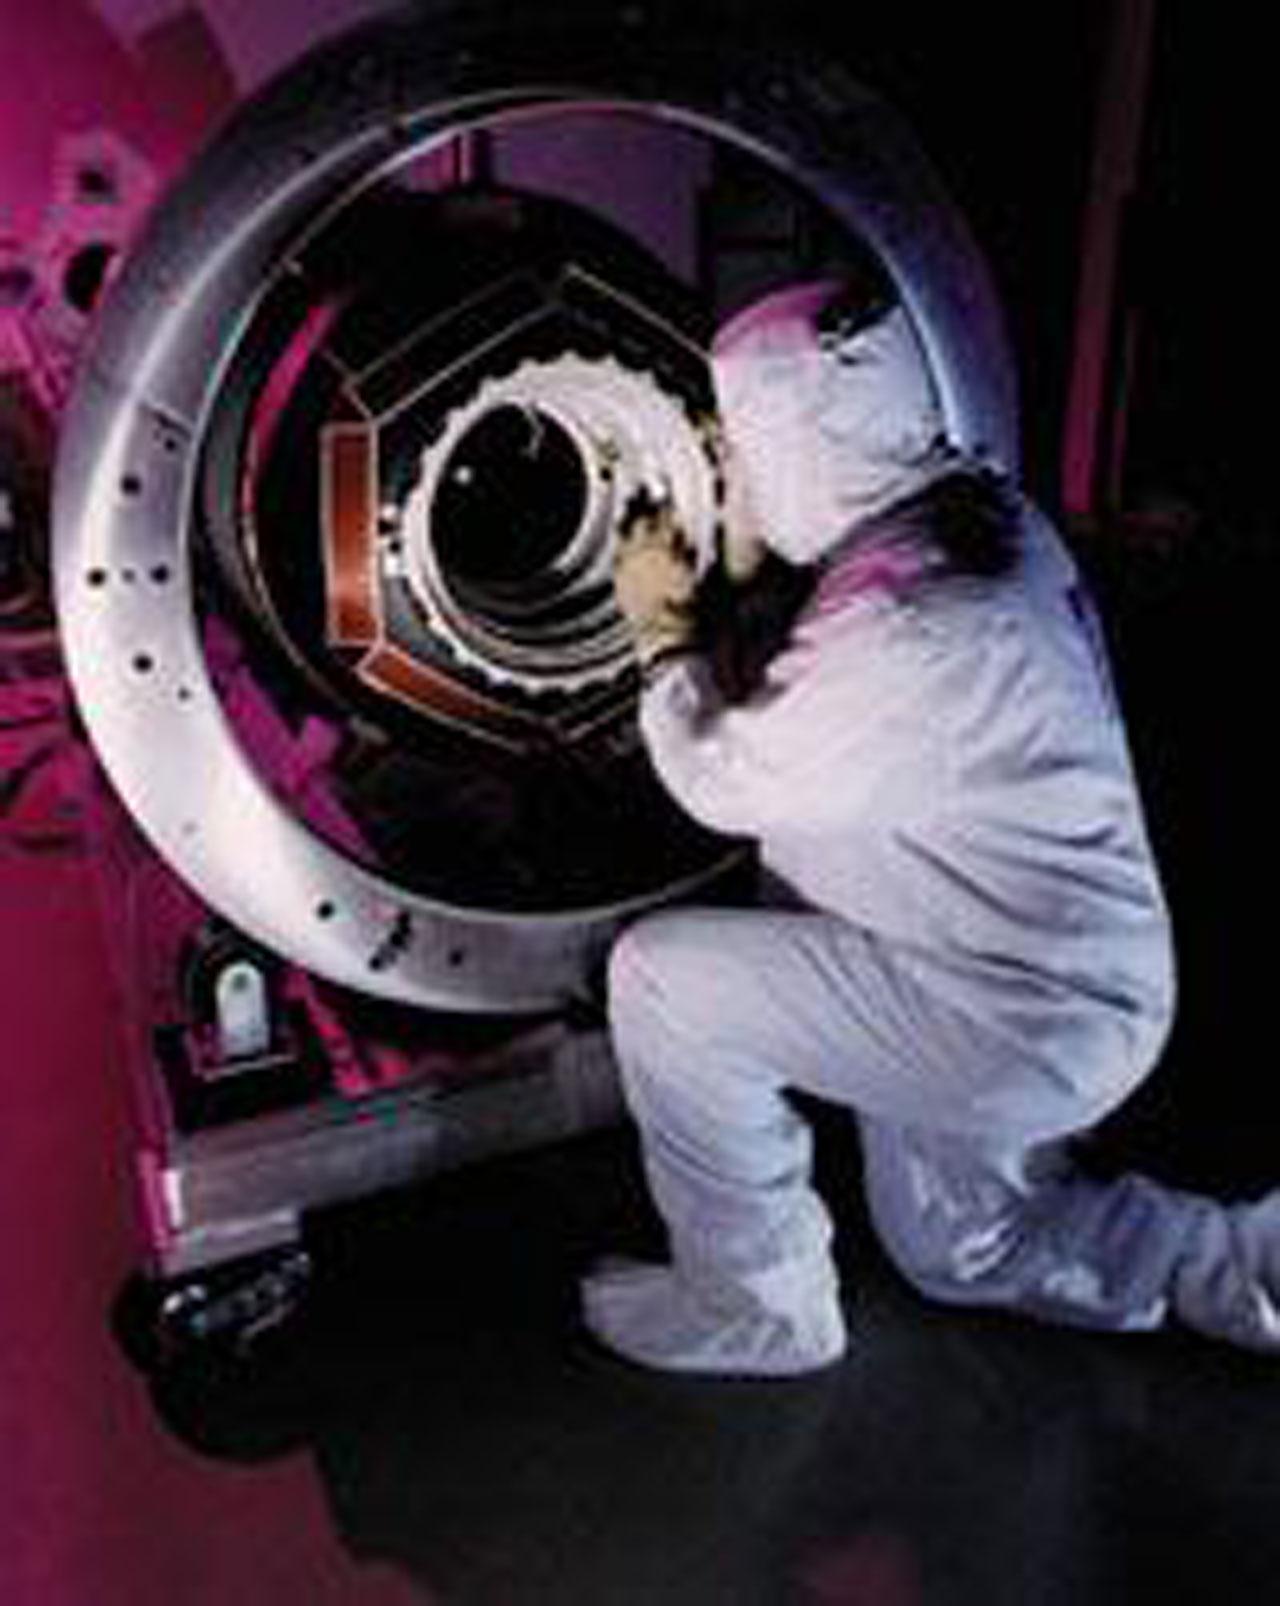 building hubble telescope - photo #21